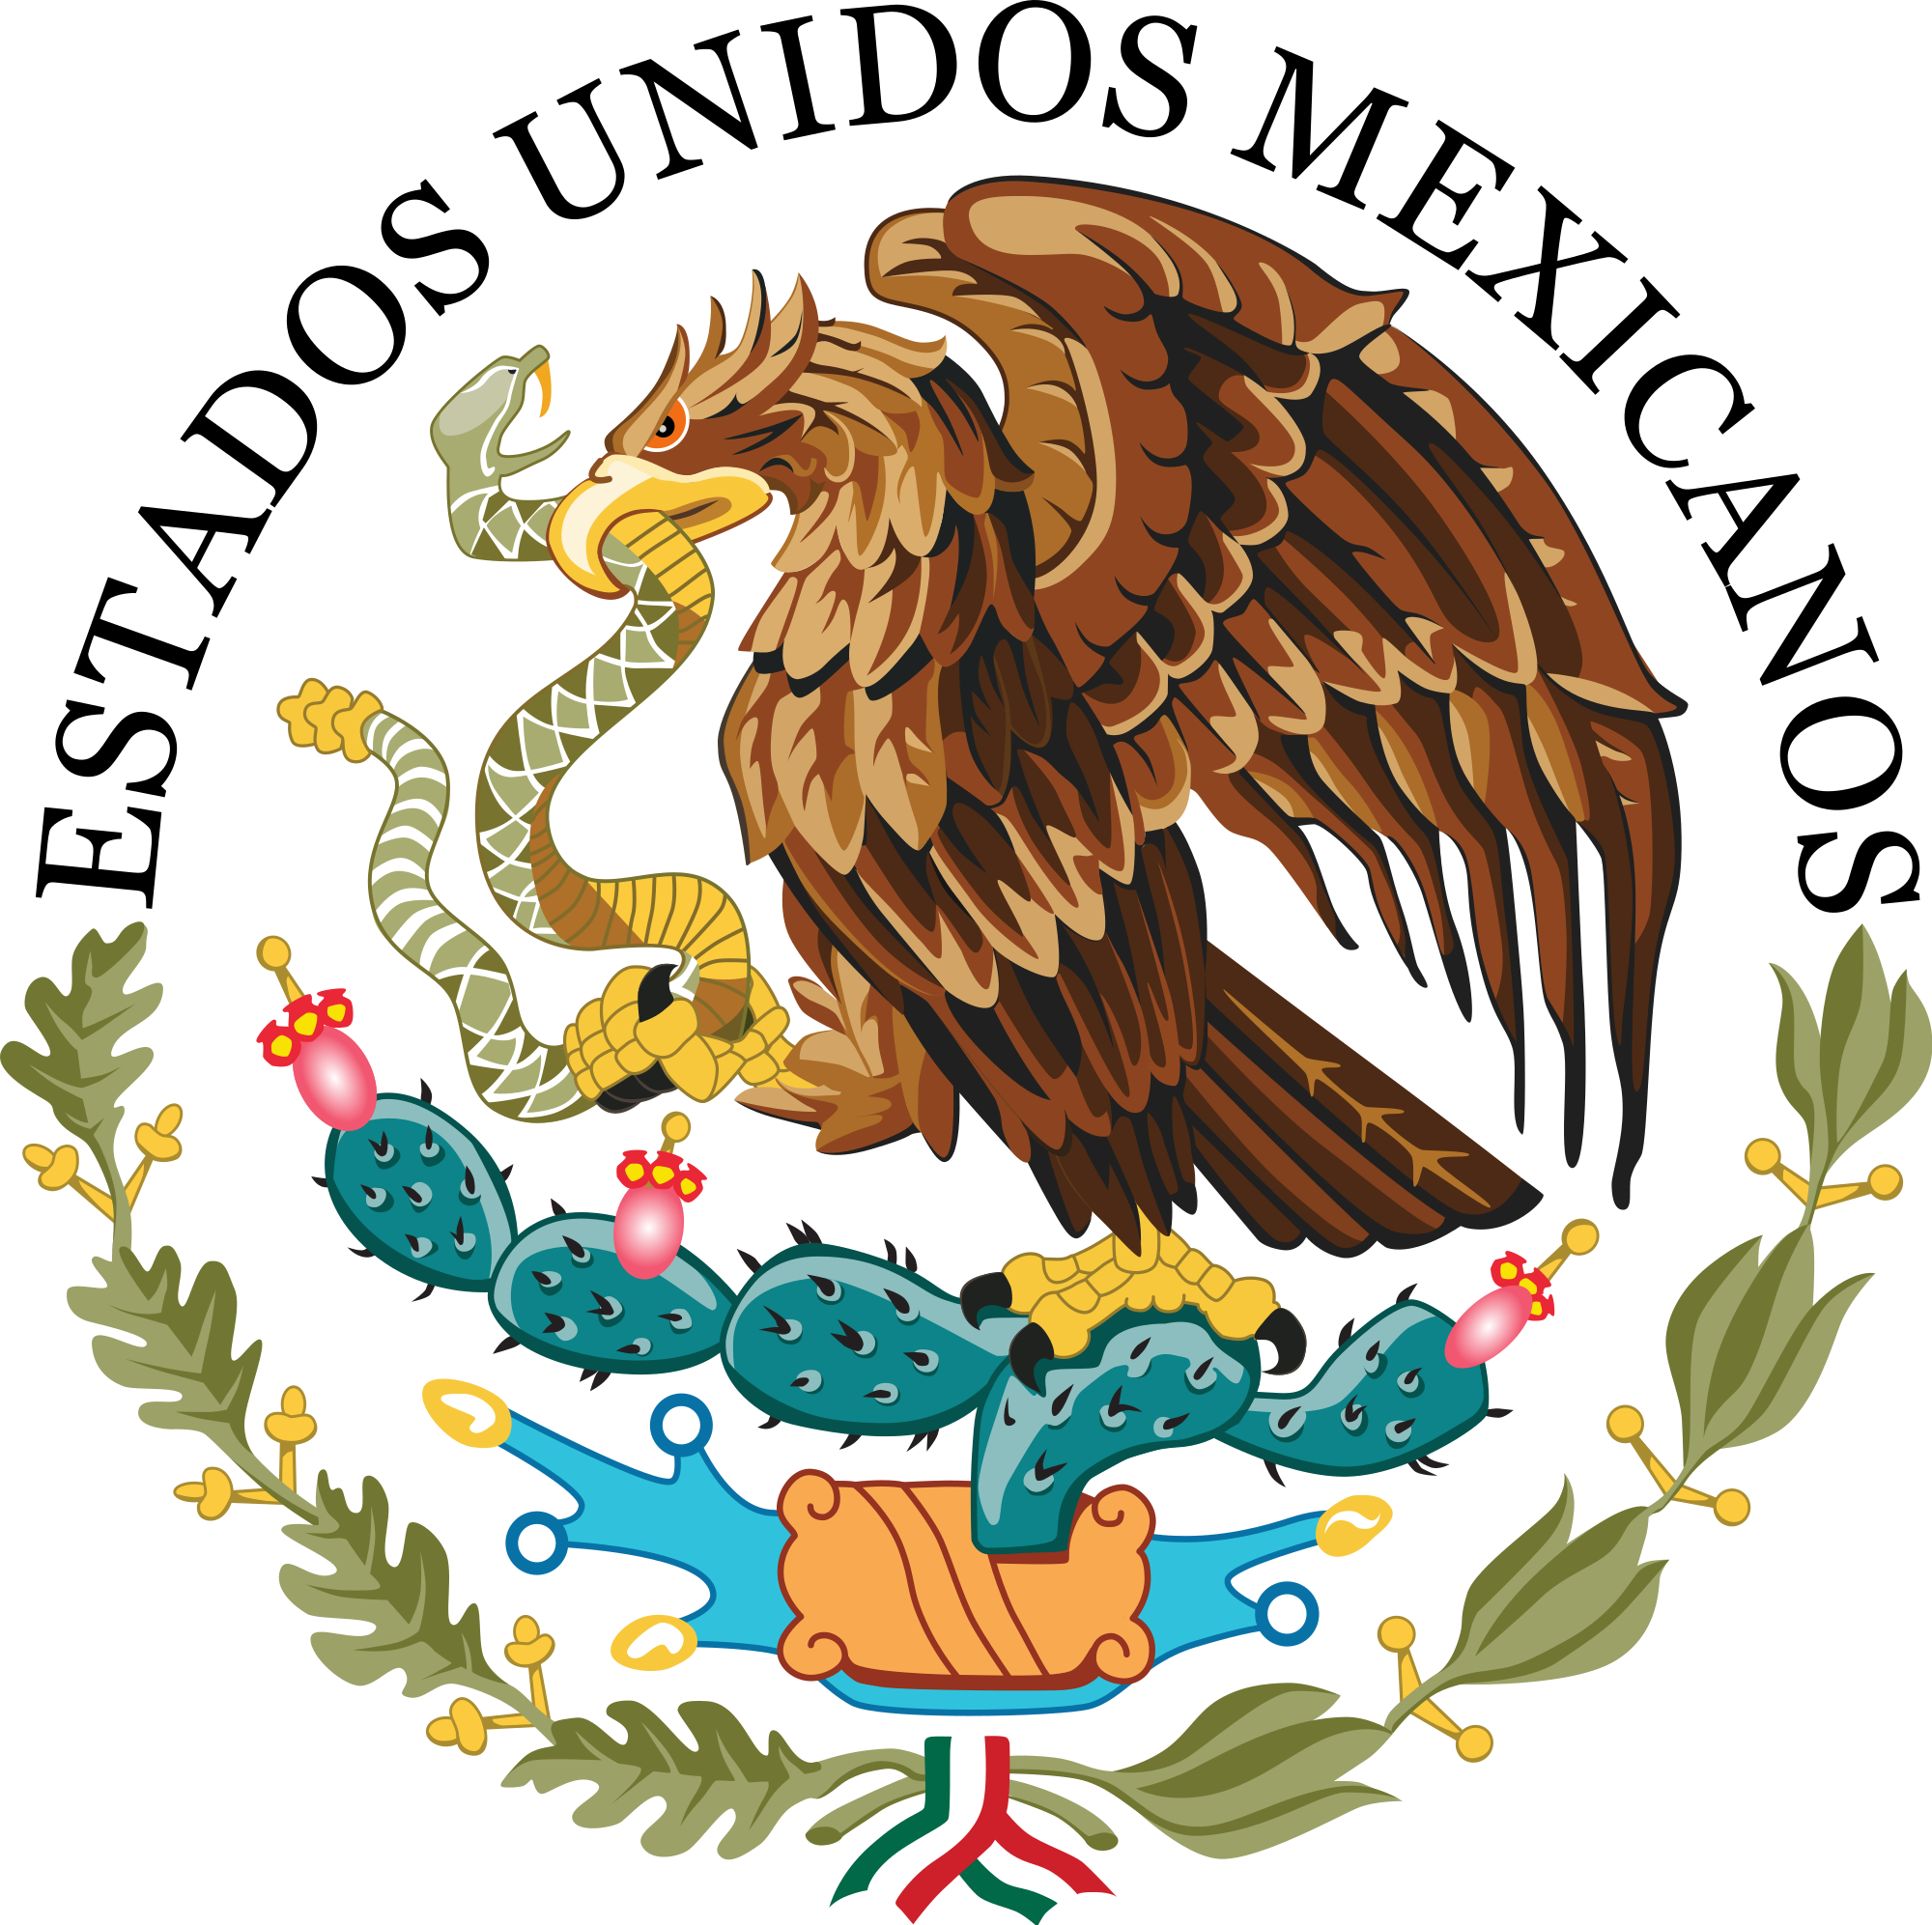 Eagles clipart eagle mexico. Coat of arms wikipedia